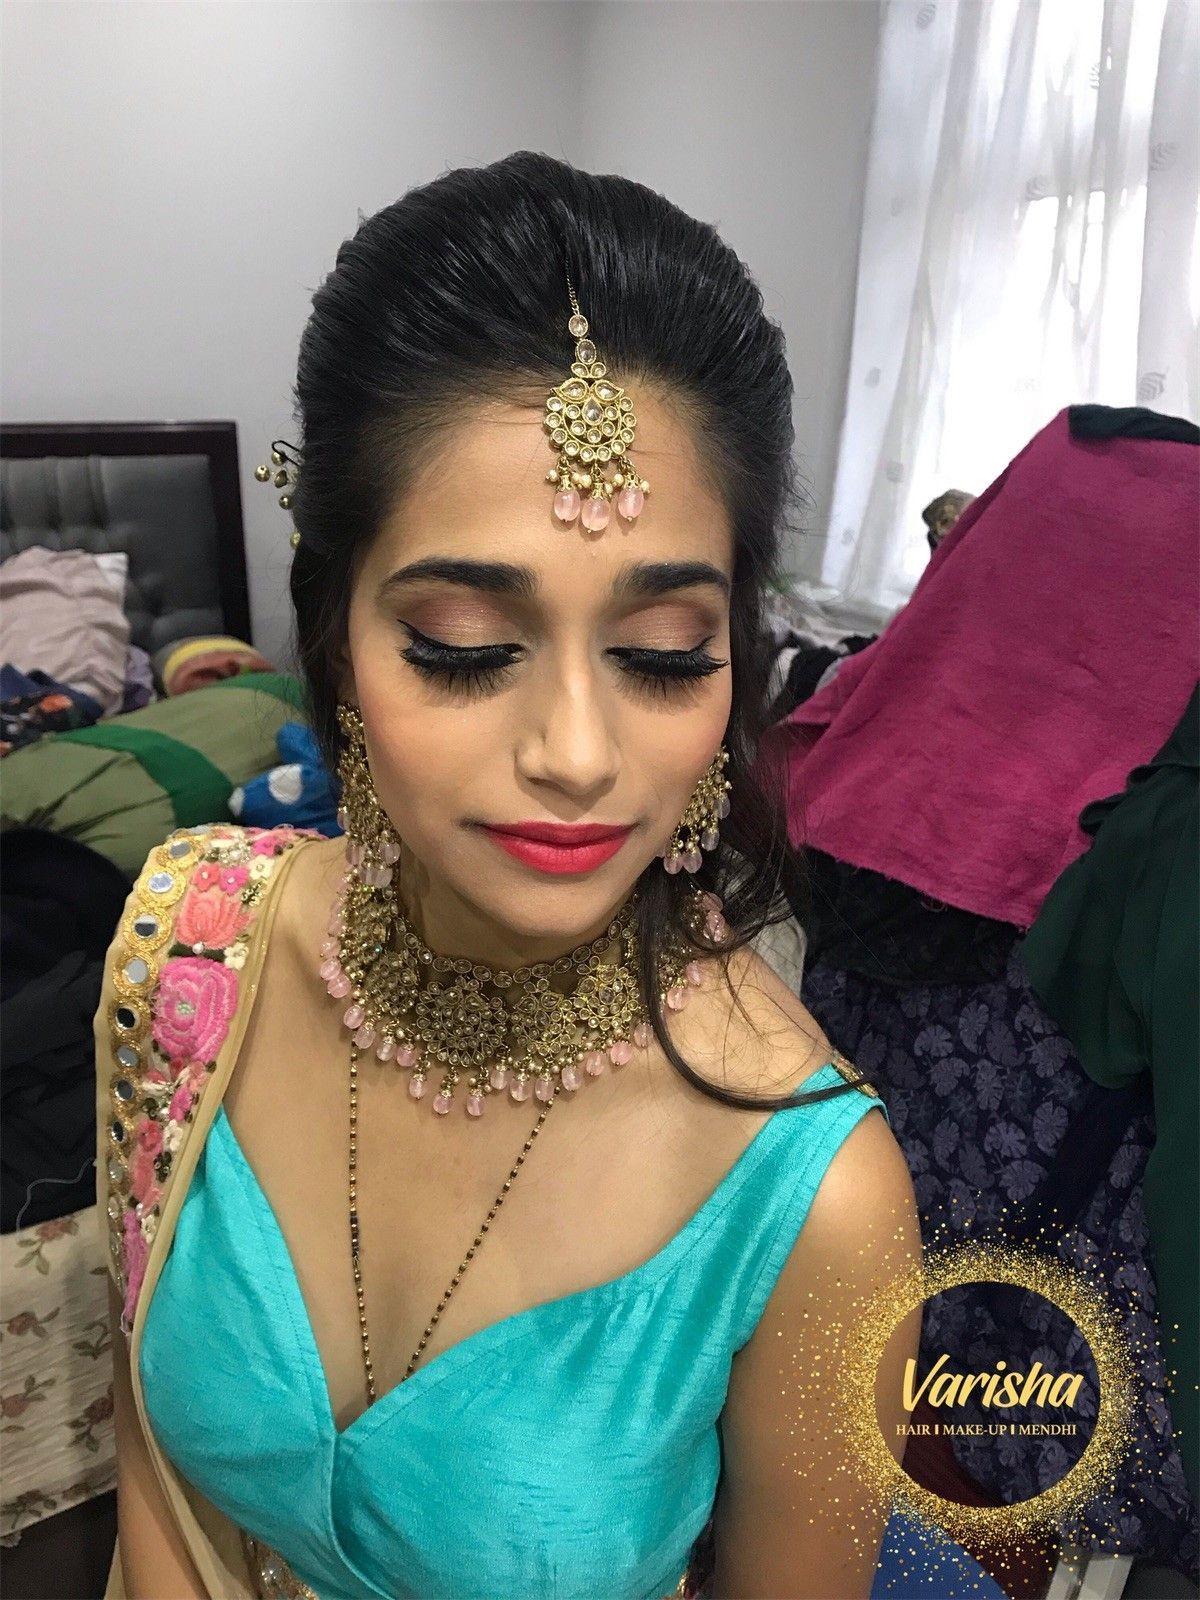 Chandlo/Sagai/Engagement Makeup Engagement makeup, Black